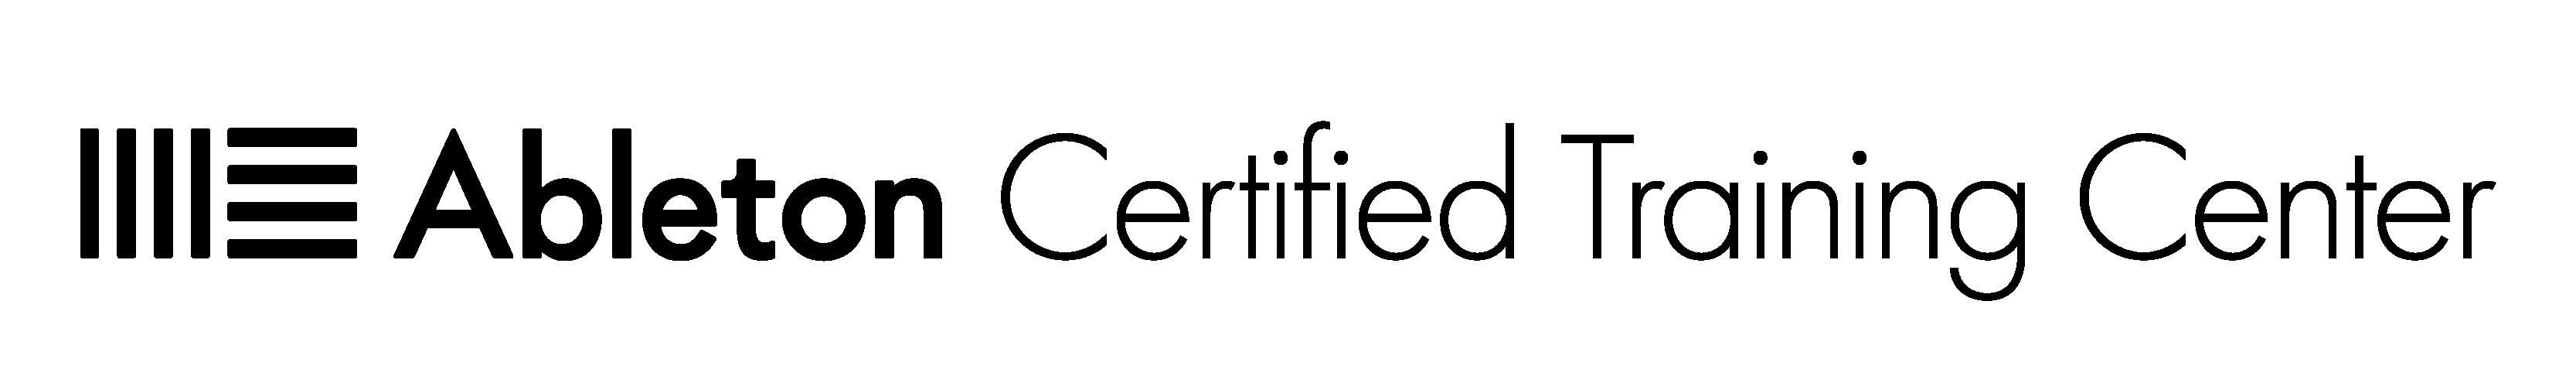 Ableton_certified_training_center_logo-01-1